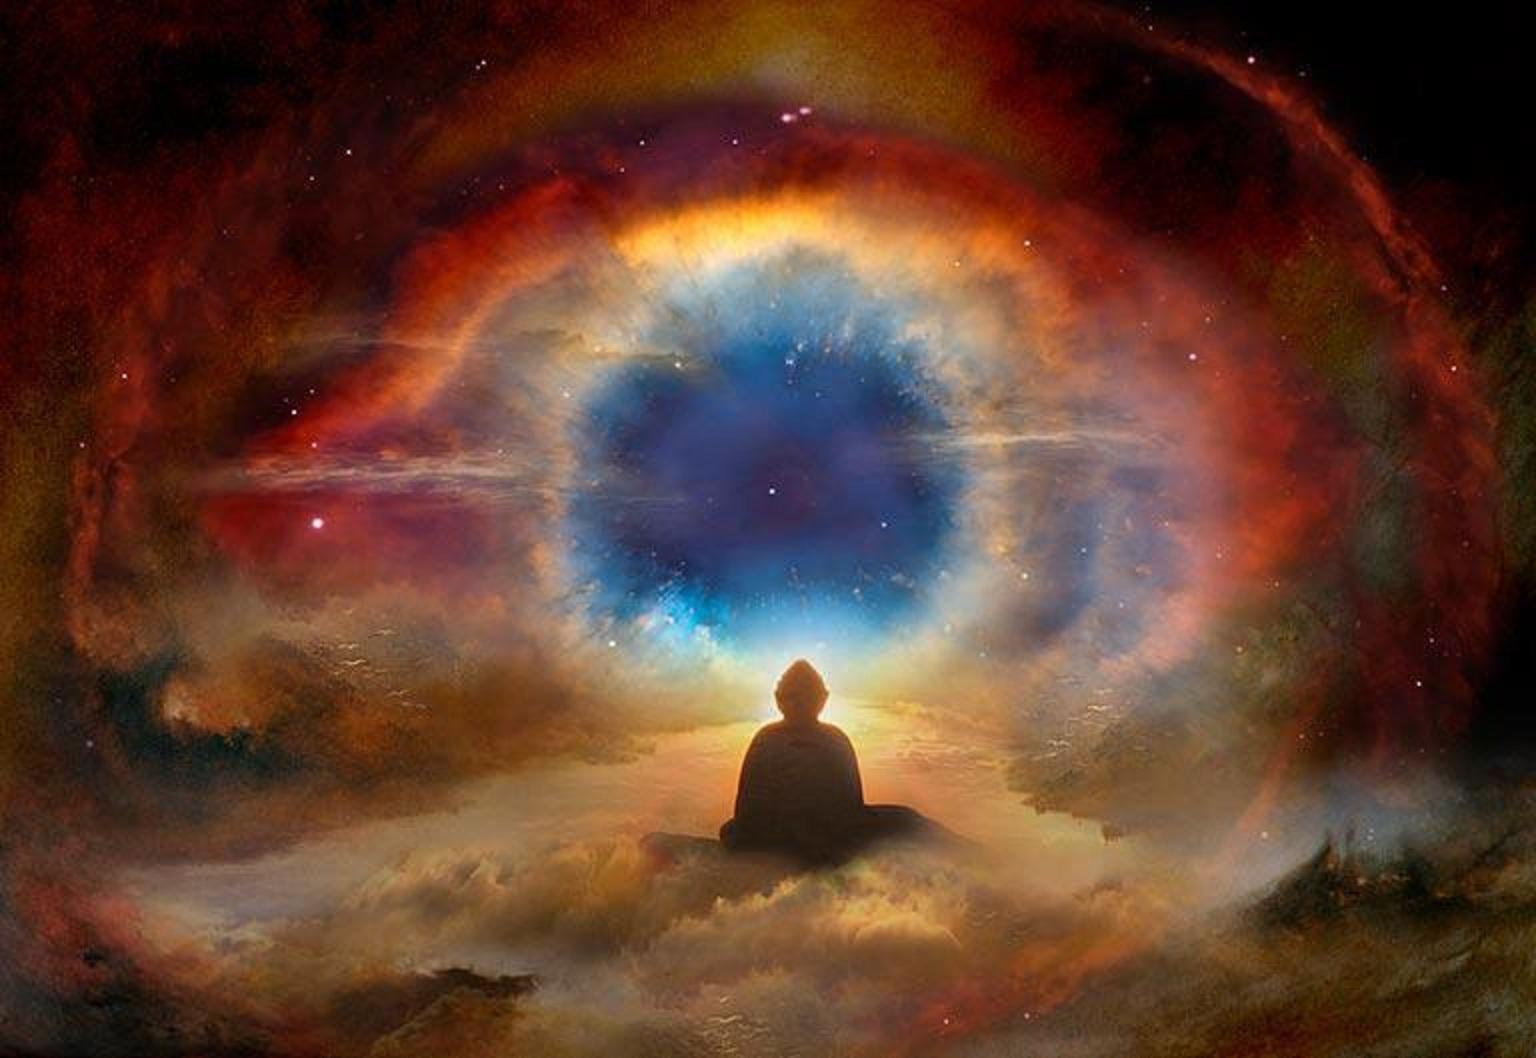 Space Eye of God